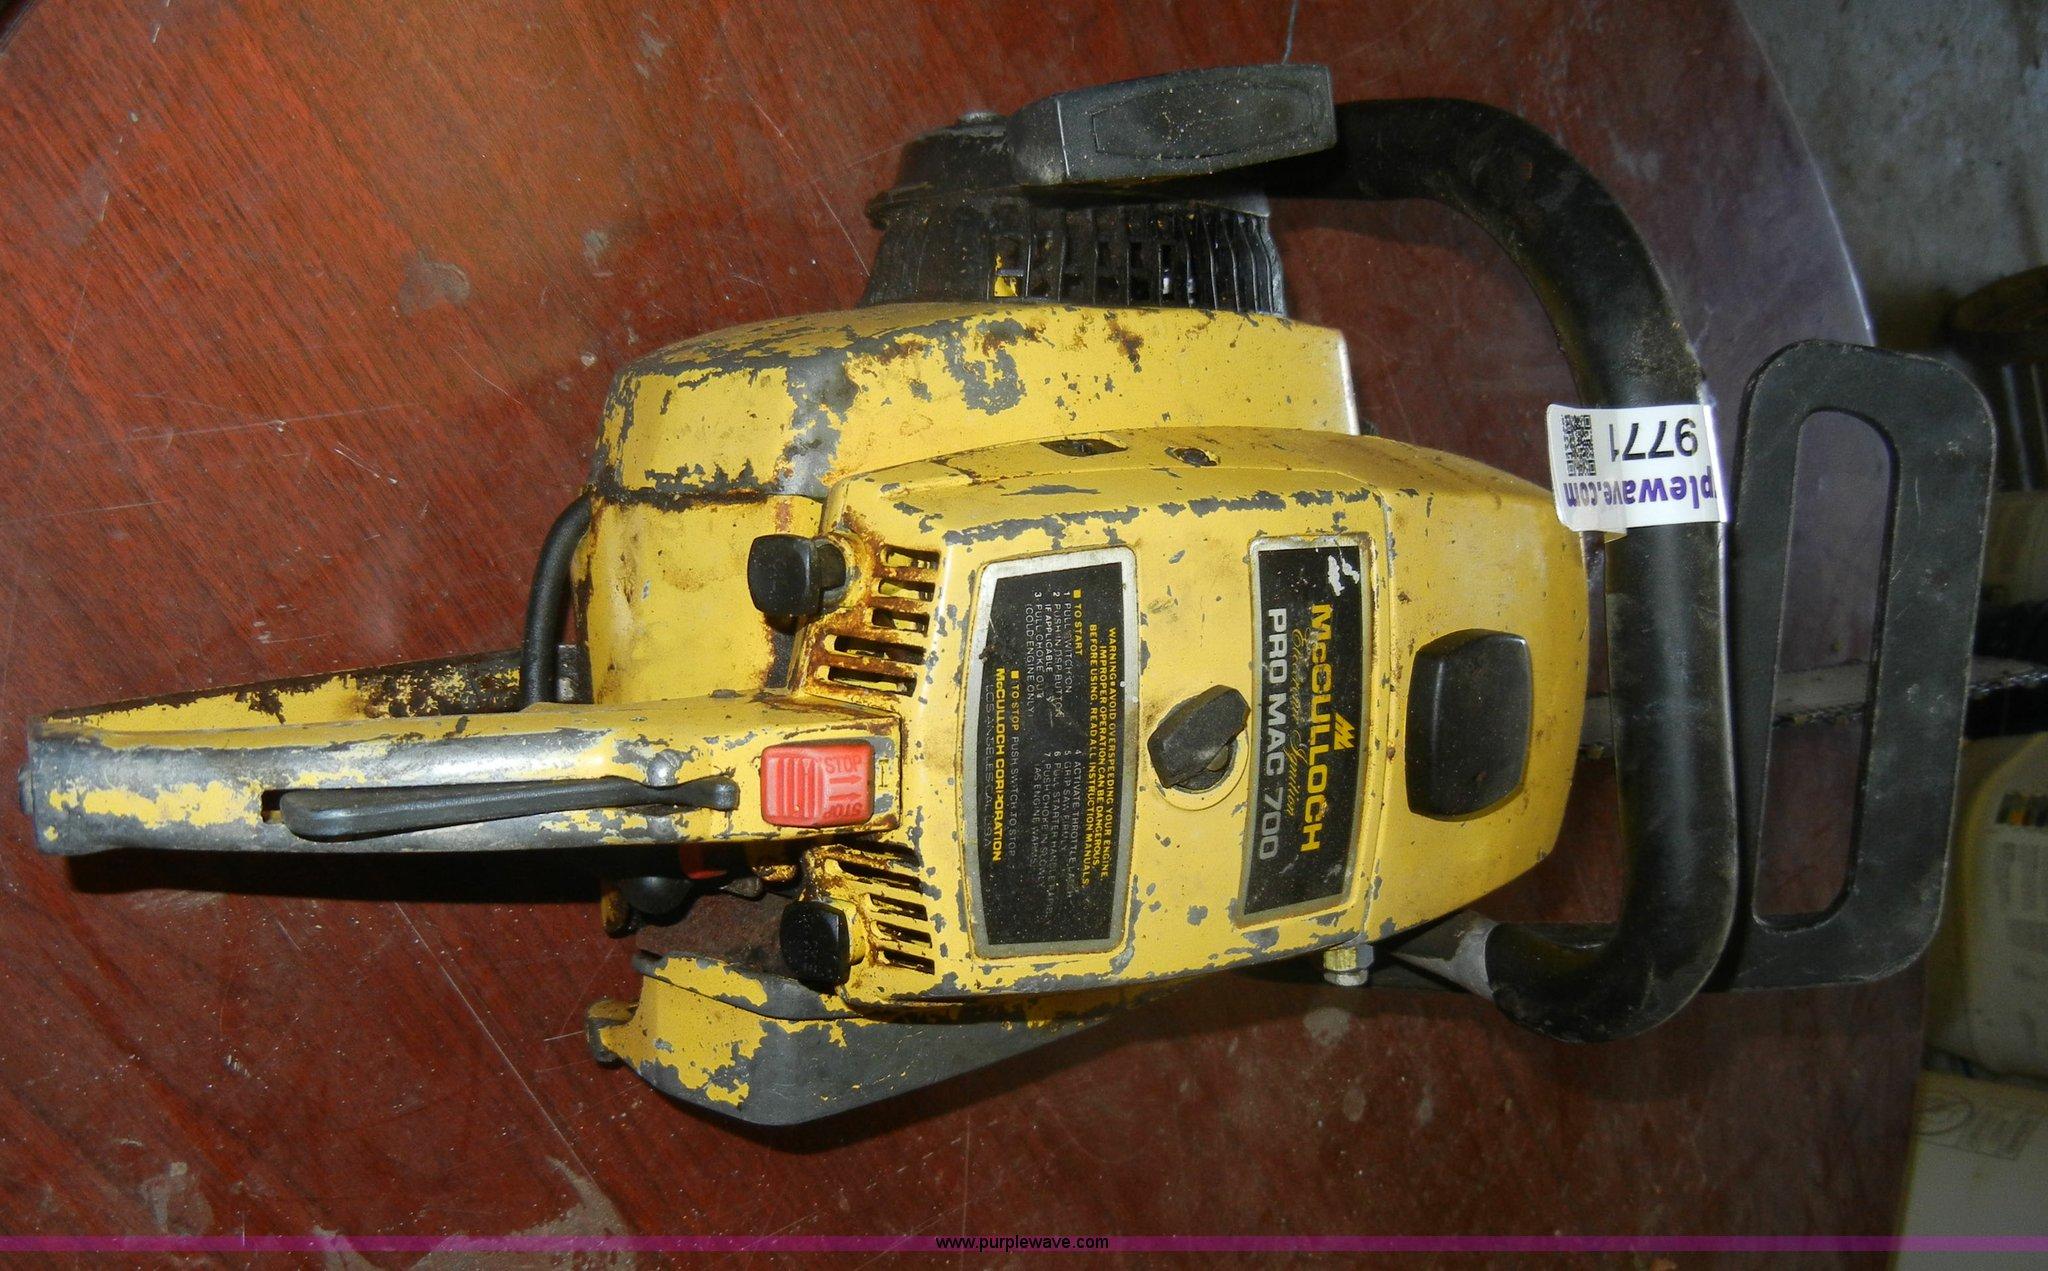 McCulloch Pro Mac 700 chainsaw | Item U9771 | SOLD! March 22